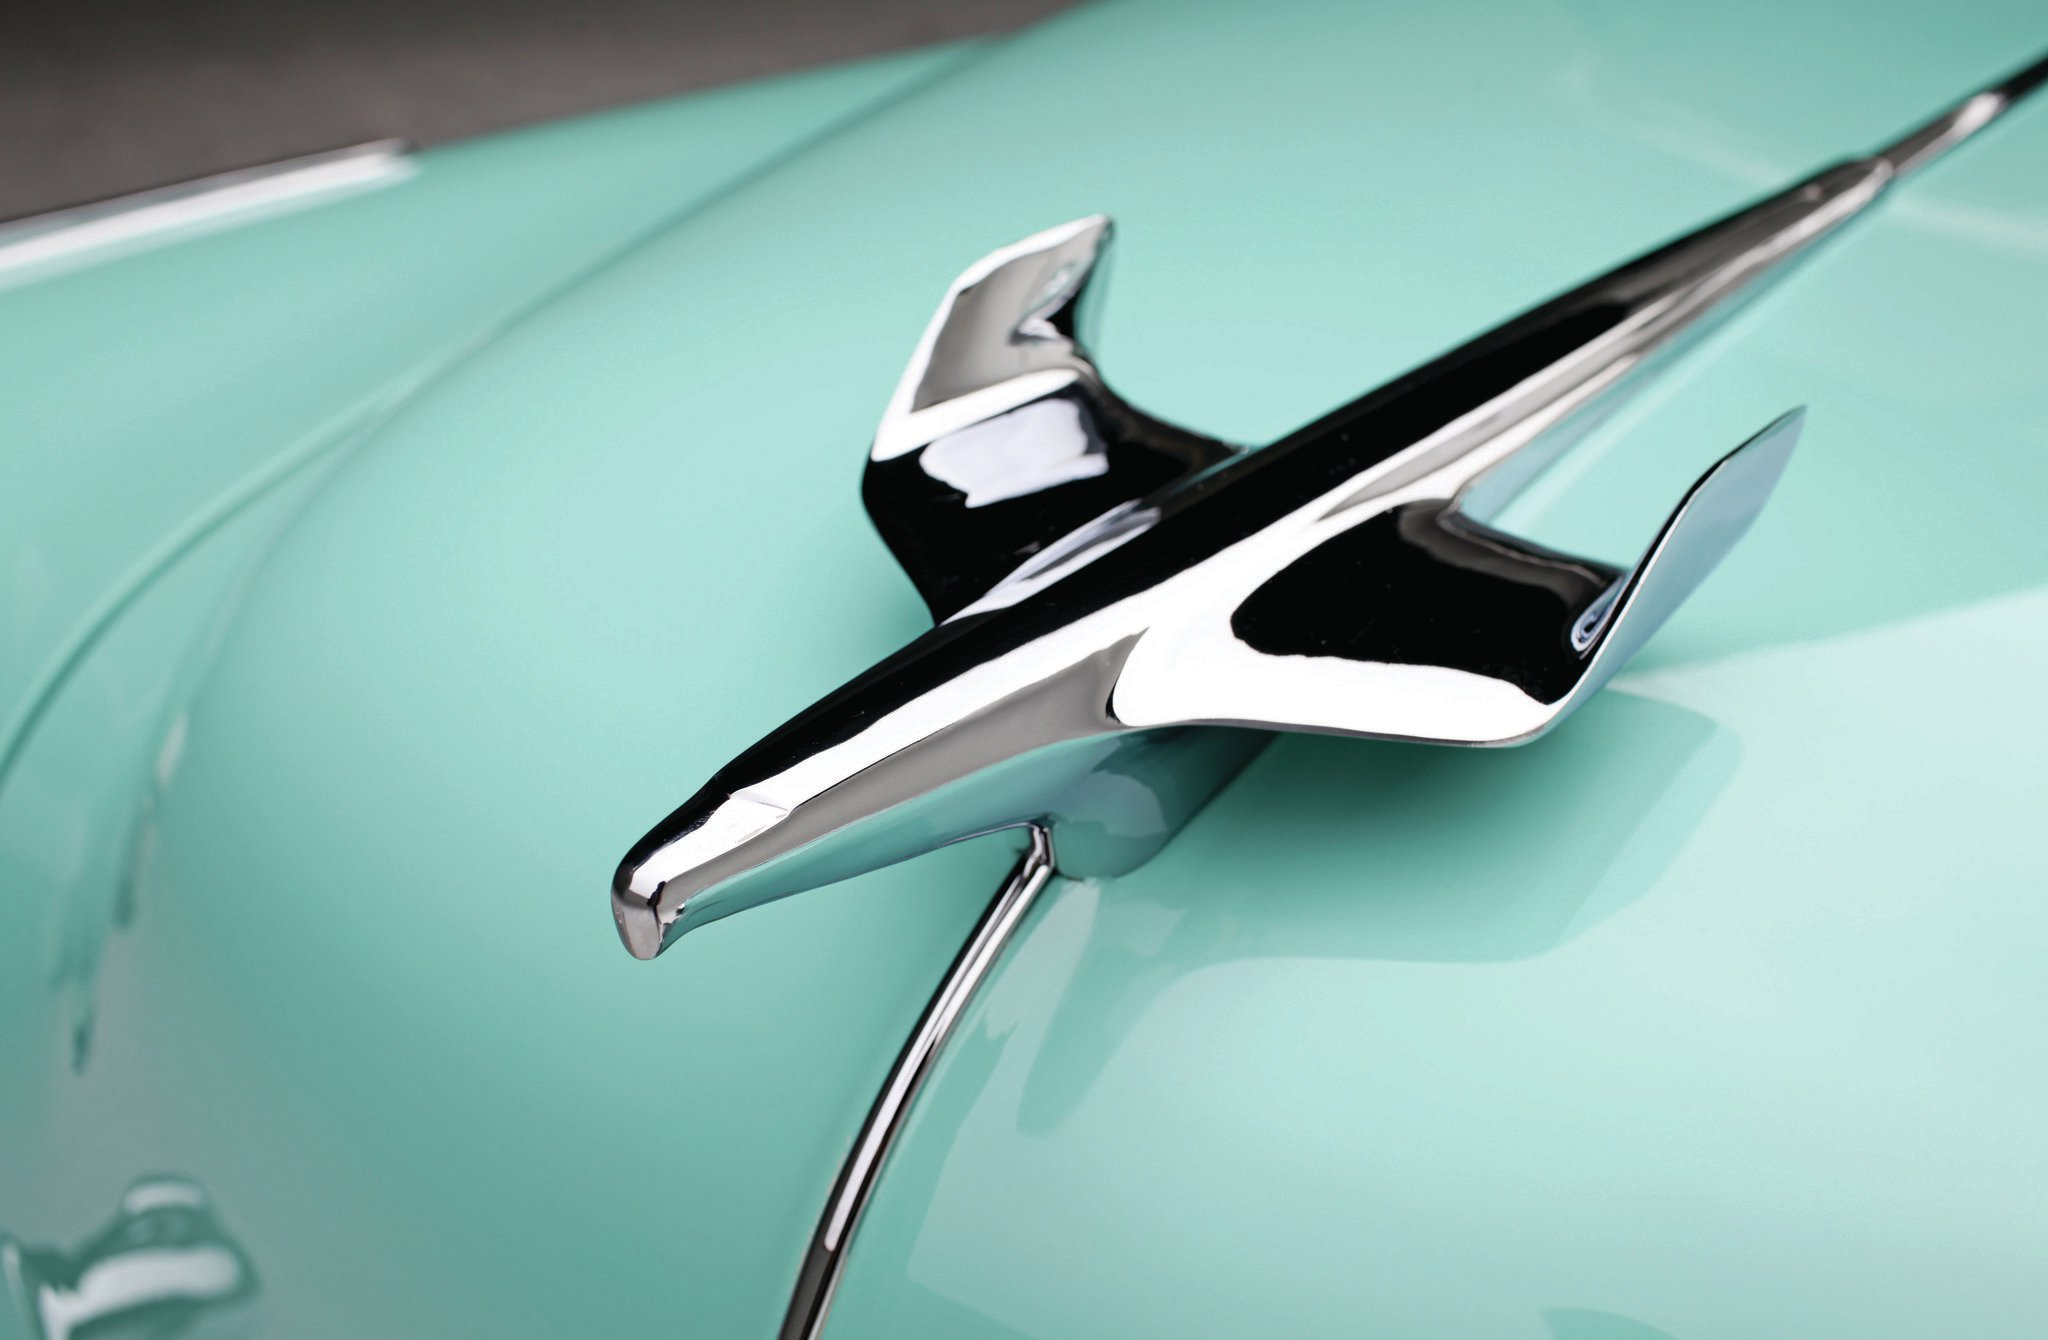 1954-chevrolet-bel-air-hood-ornament - Lowrider